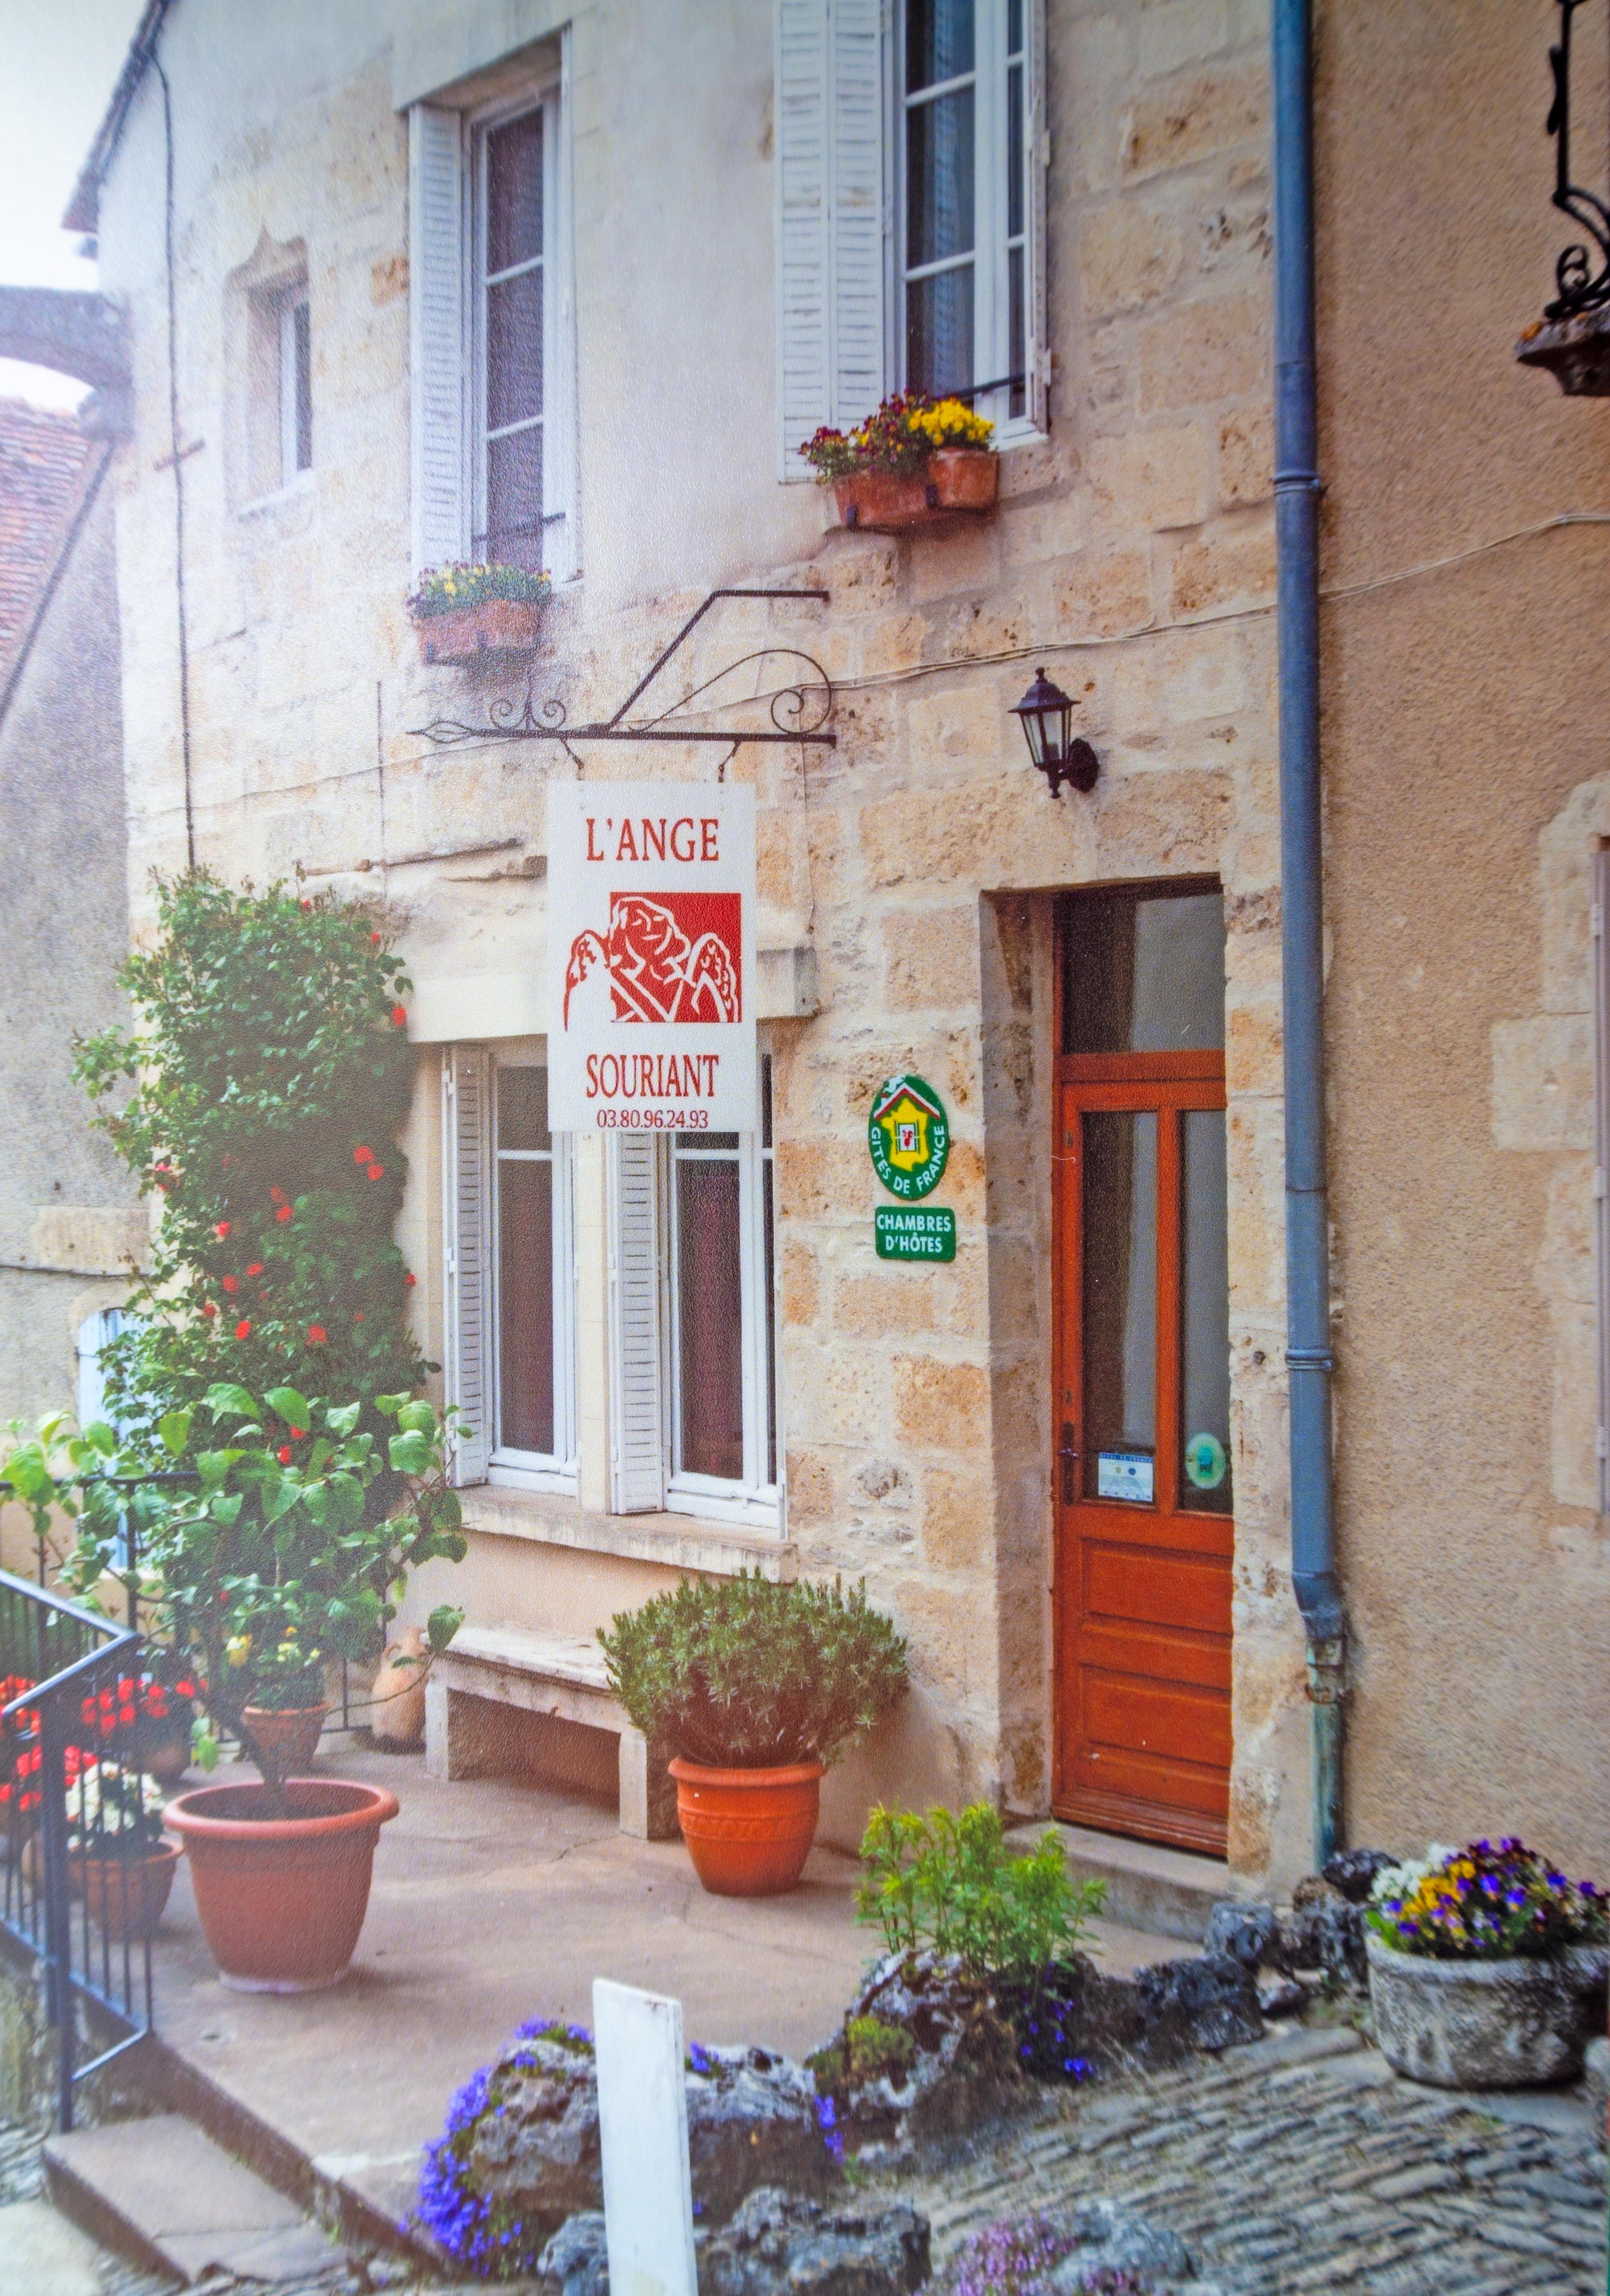 Flavigny-sur-Ozerain - L'Ange Souriant Chambres D'Hotes